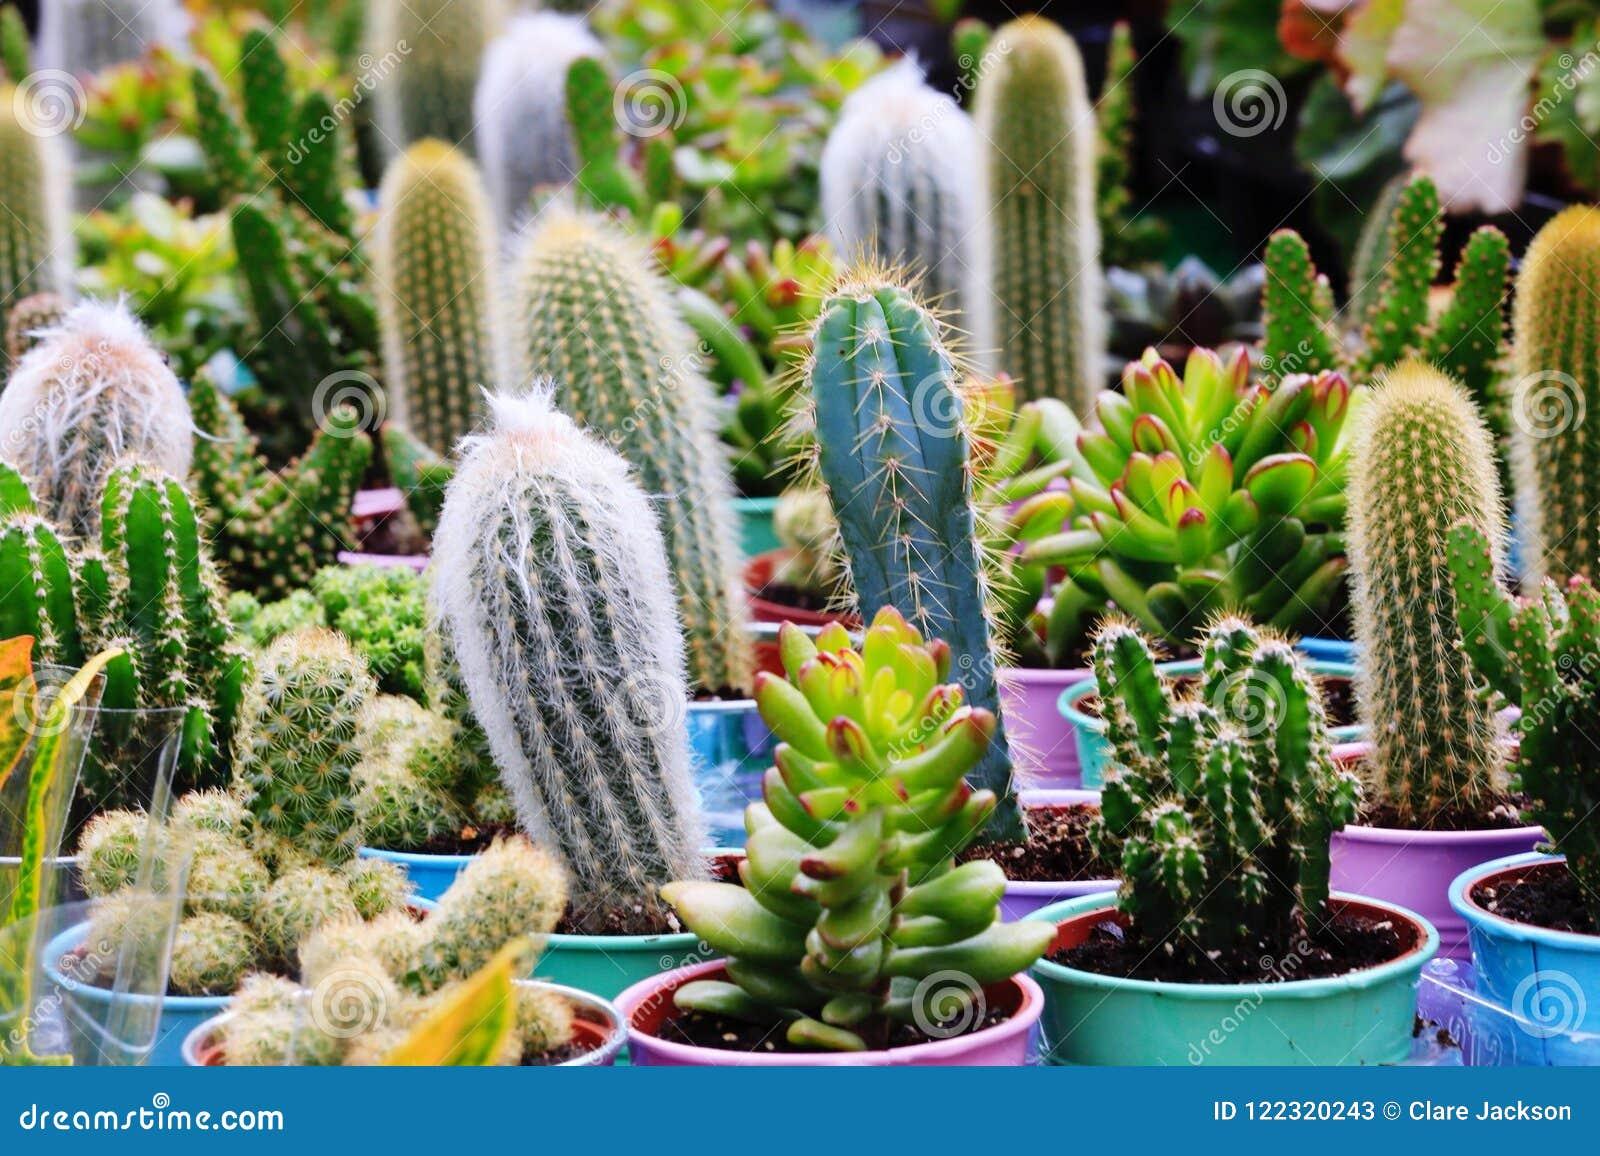 Cacti cactus and succulents